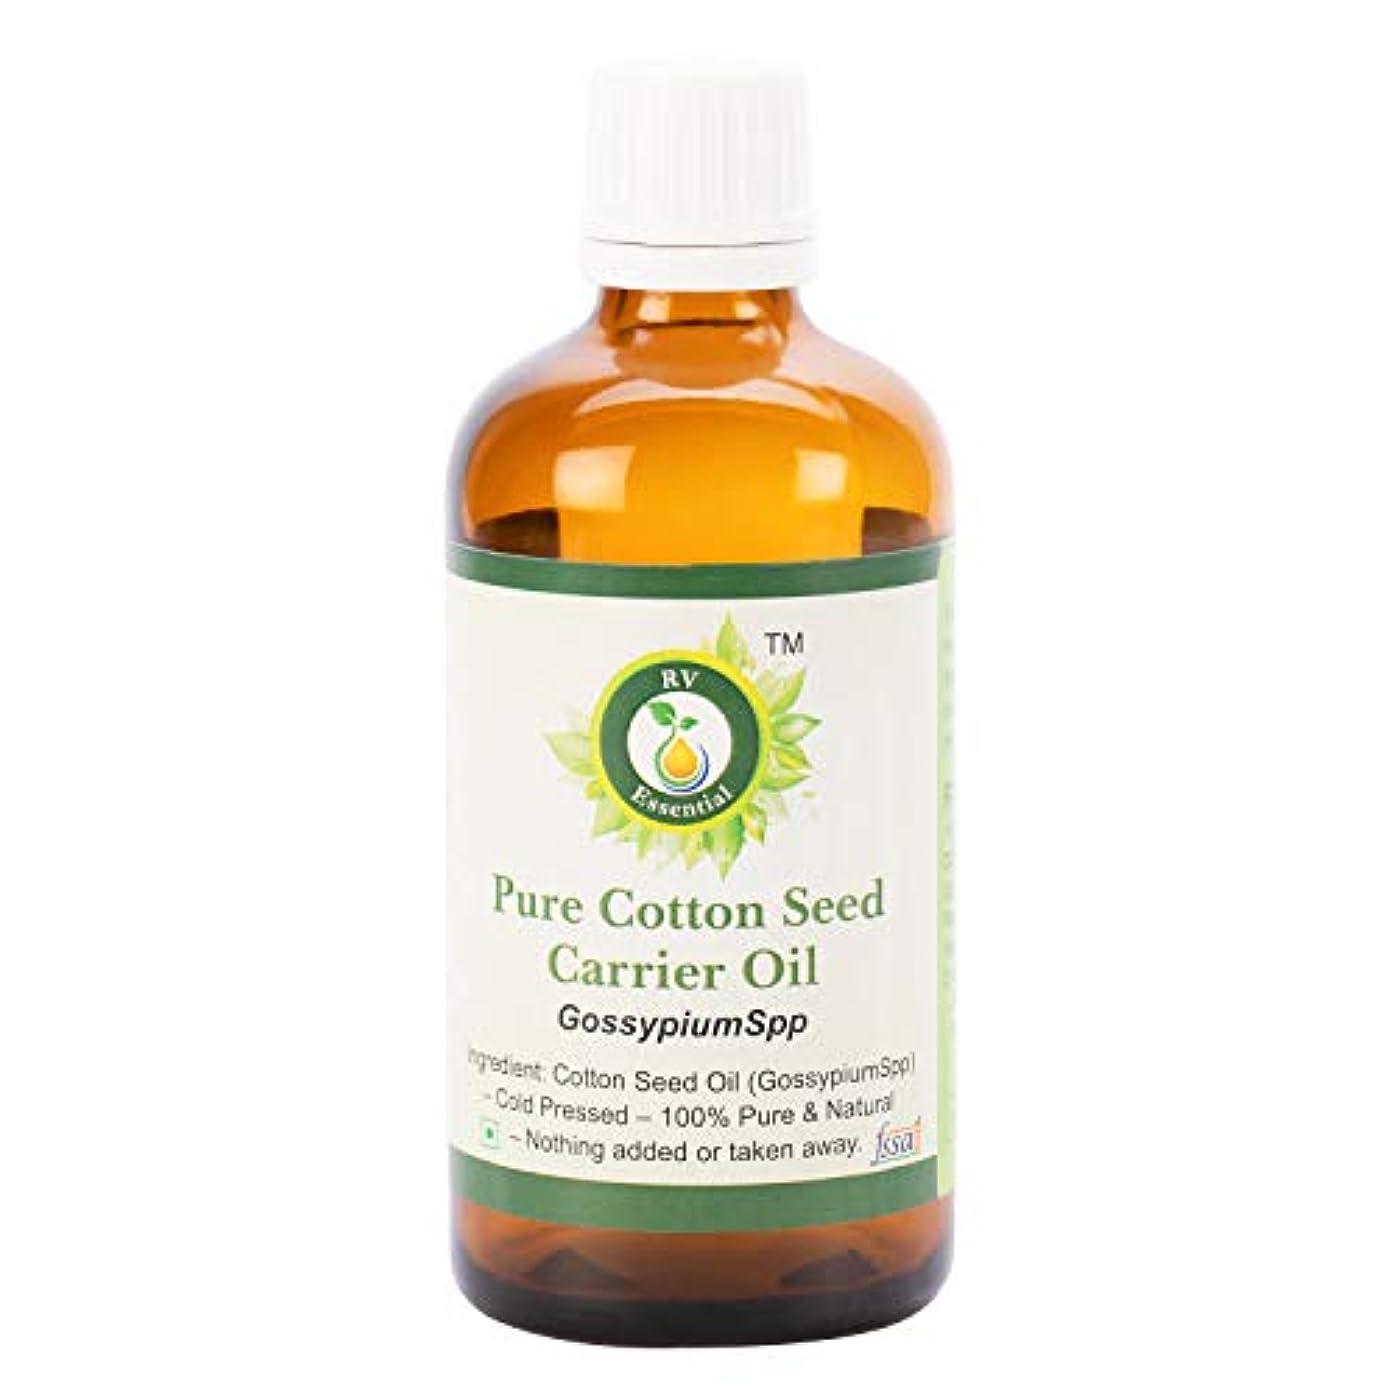 R V Essential 純粋な綿の種子キャリアオイル10ml (0.338oz)- Gossypium Spp (100%ピュア&ナチュラルコールドPressed) Pure Cotton Seed Carrier...